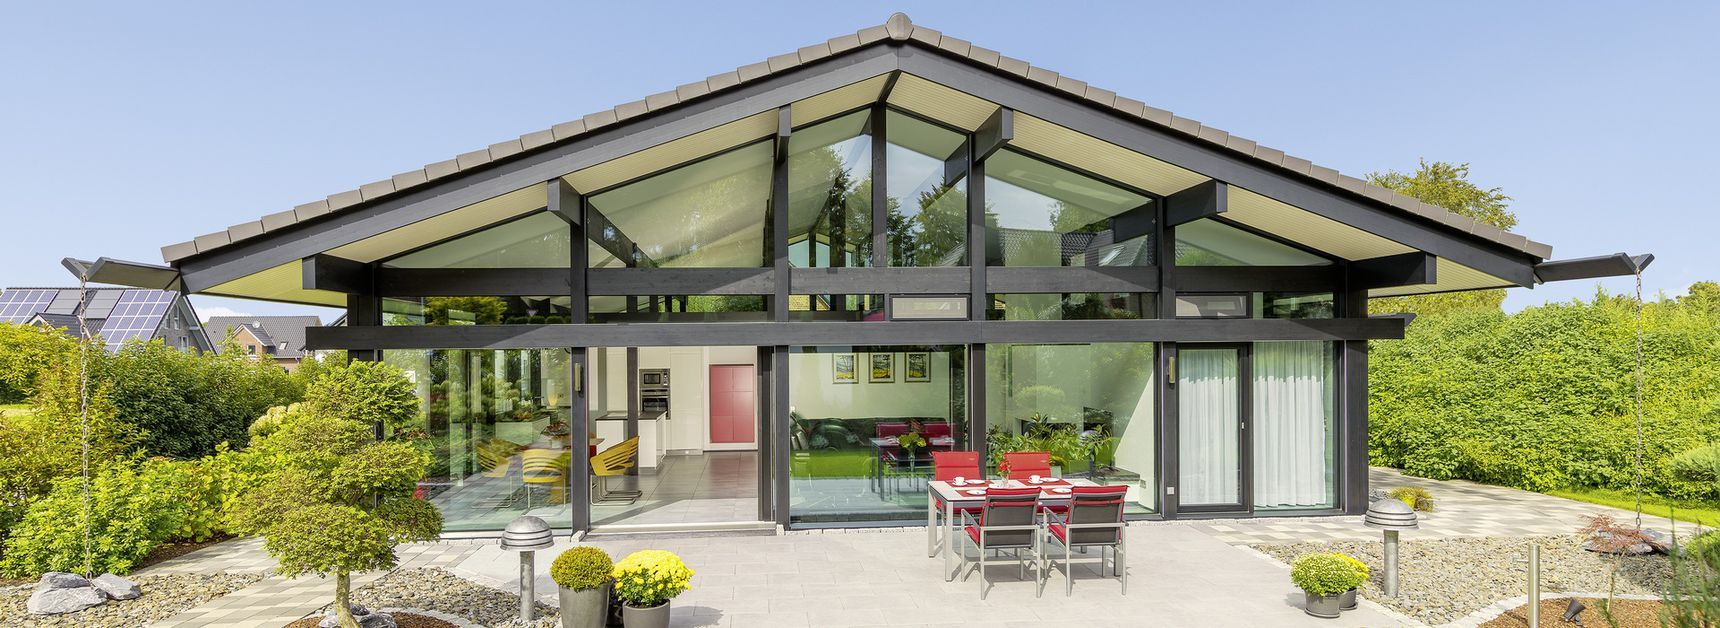 Fertighaus bungalow holz  HUF Haus Bungalow - Modernes Fertighaus aus Holz und Glas - HUF ...